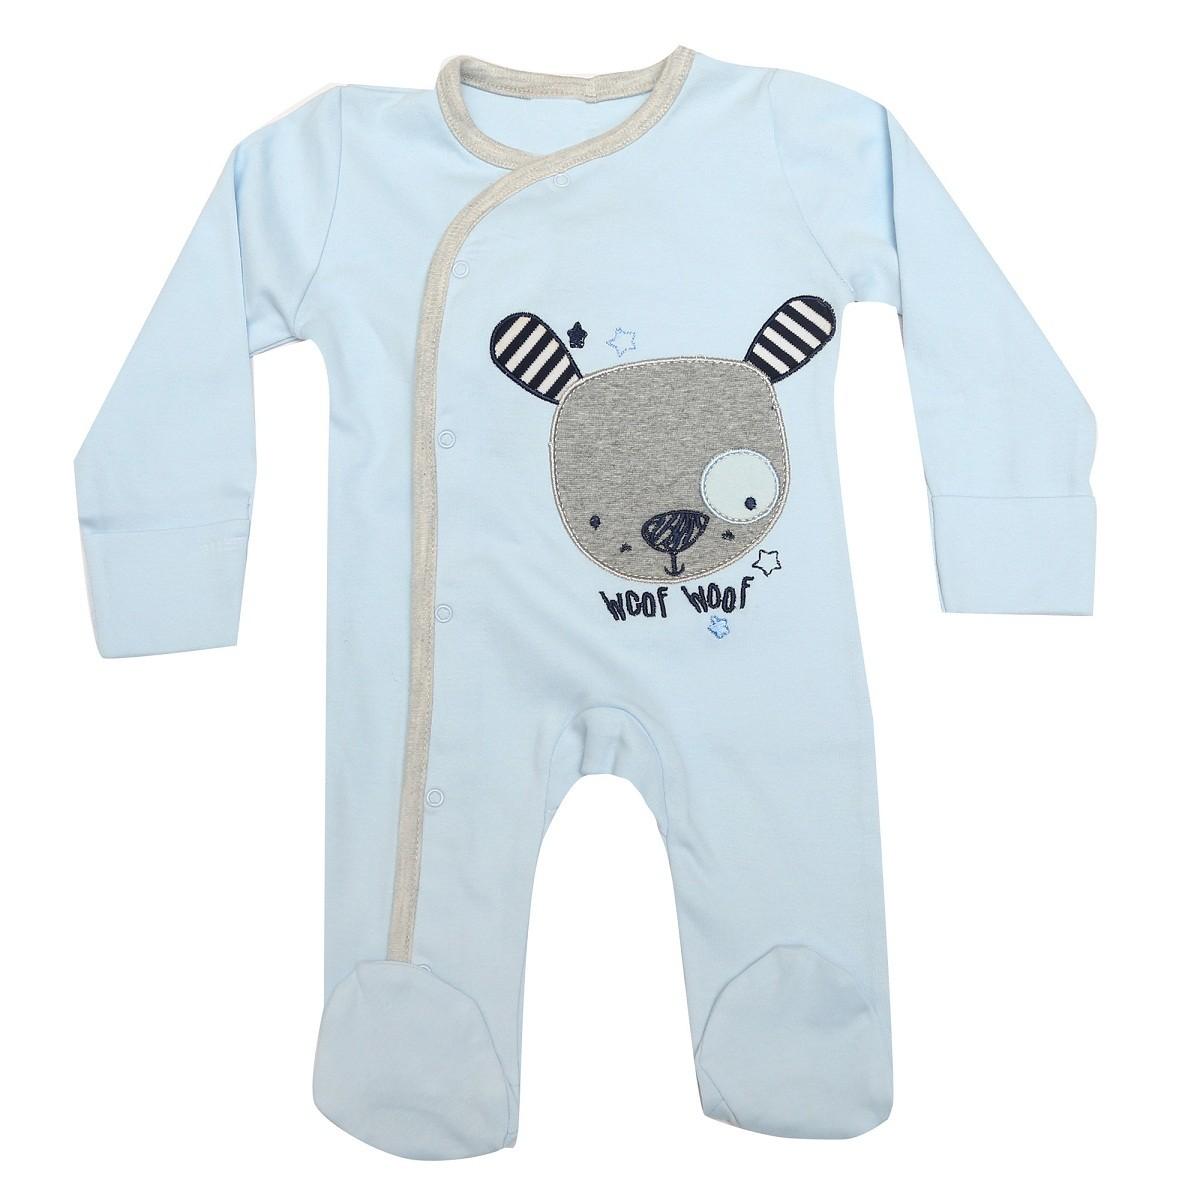 940c1351c871 Kaboos 100% Cotton Sky Colour Bodysuit For Baby Boys